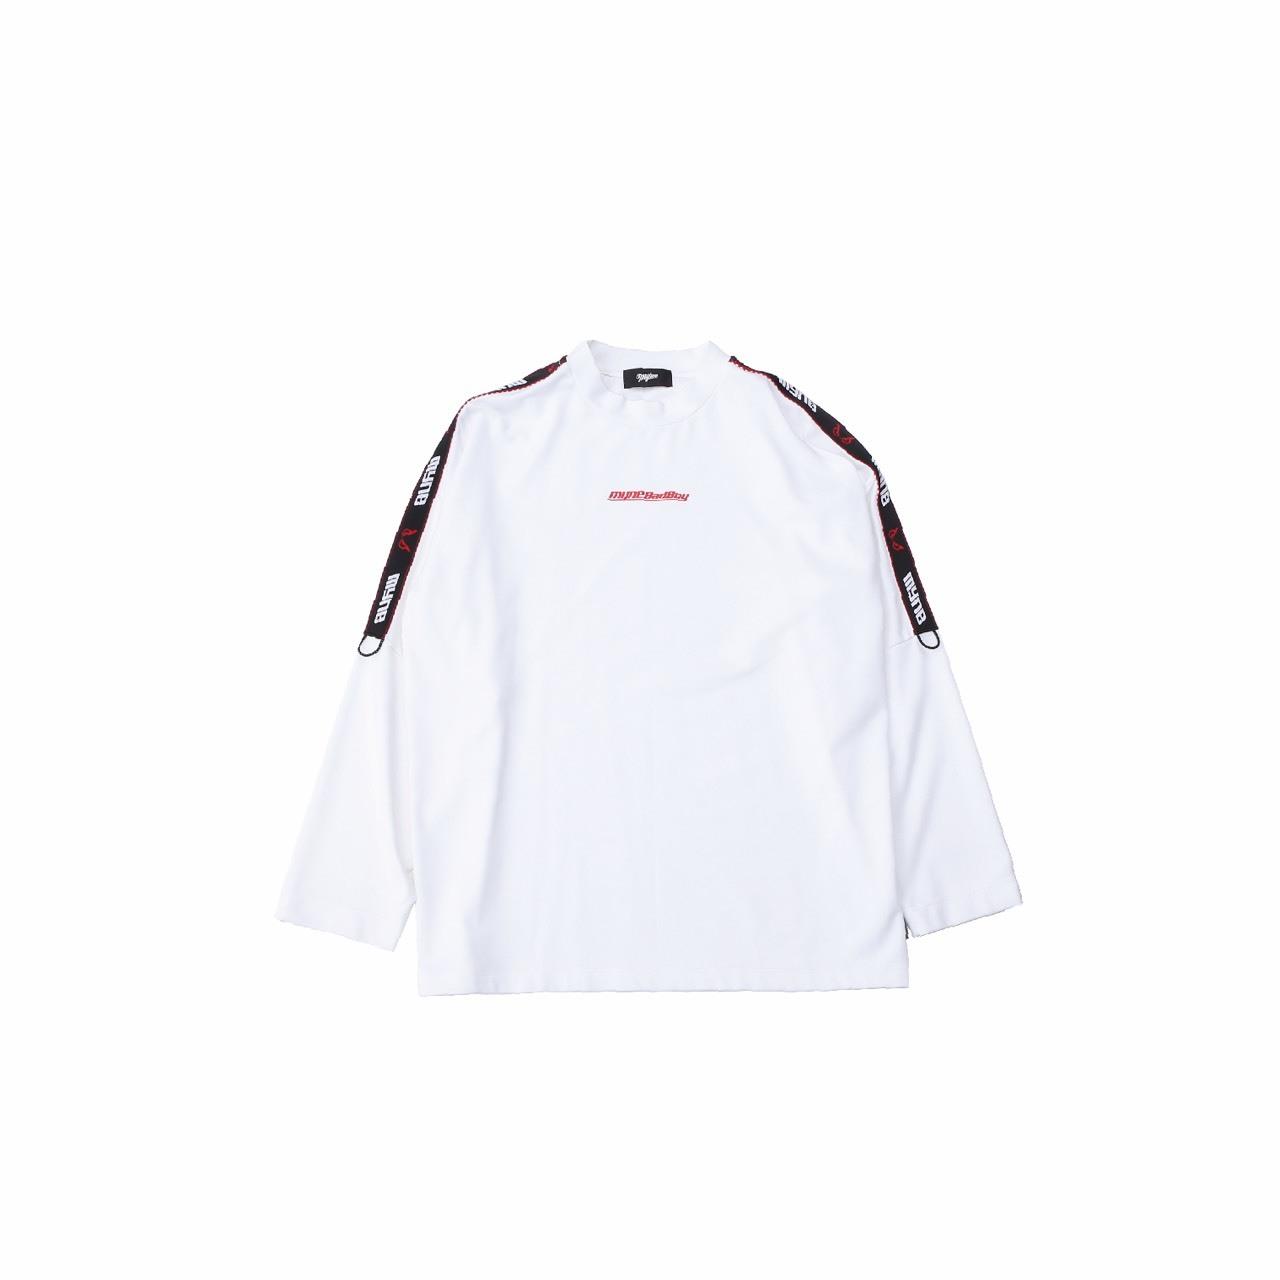 MYne × BADBOY L/S T-shirt / WHITE - 画像1